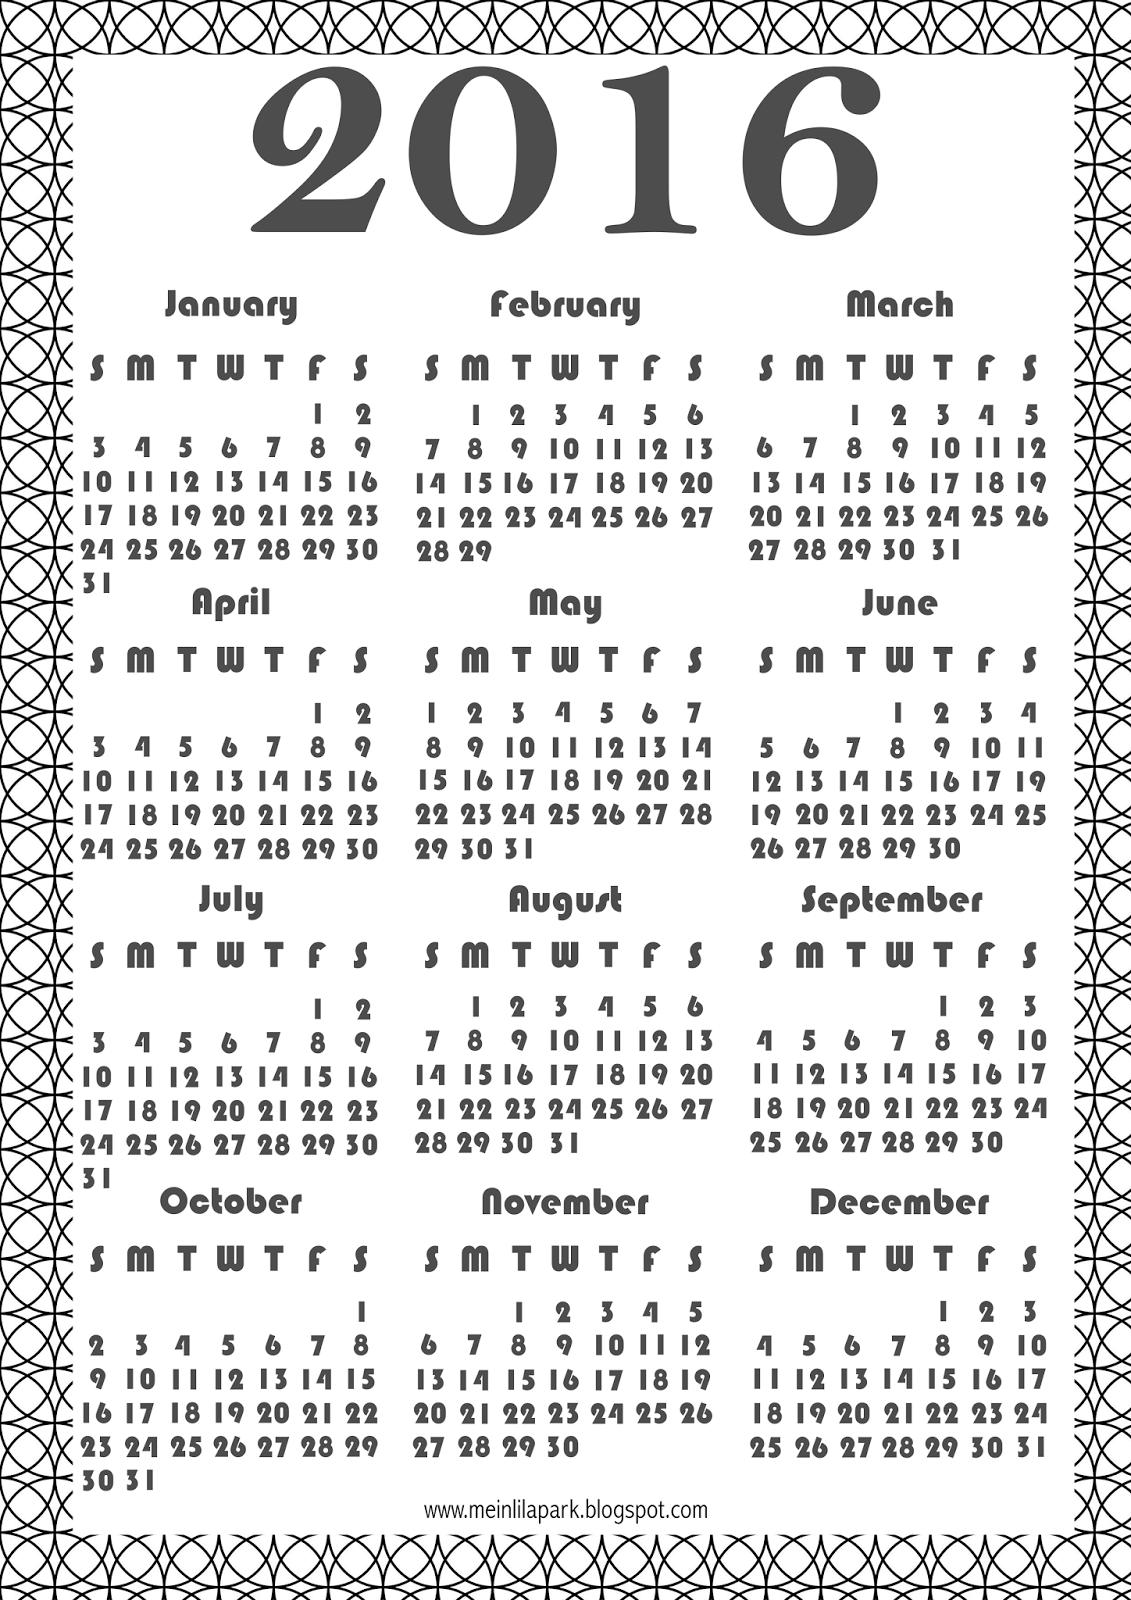 FREE printable 2016 coloring calendar   FREE PRINTABLES ✄ and ...